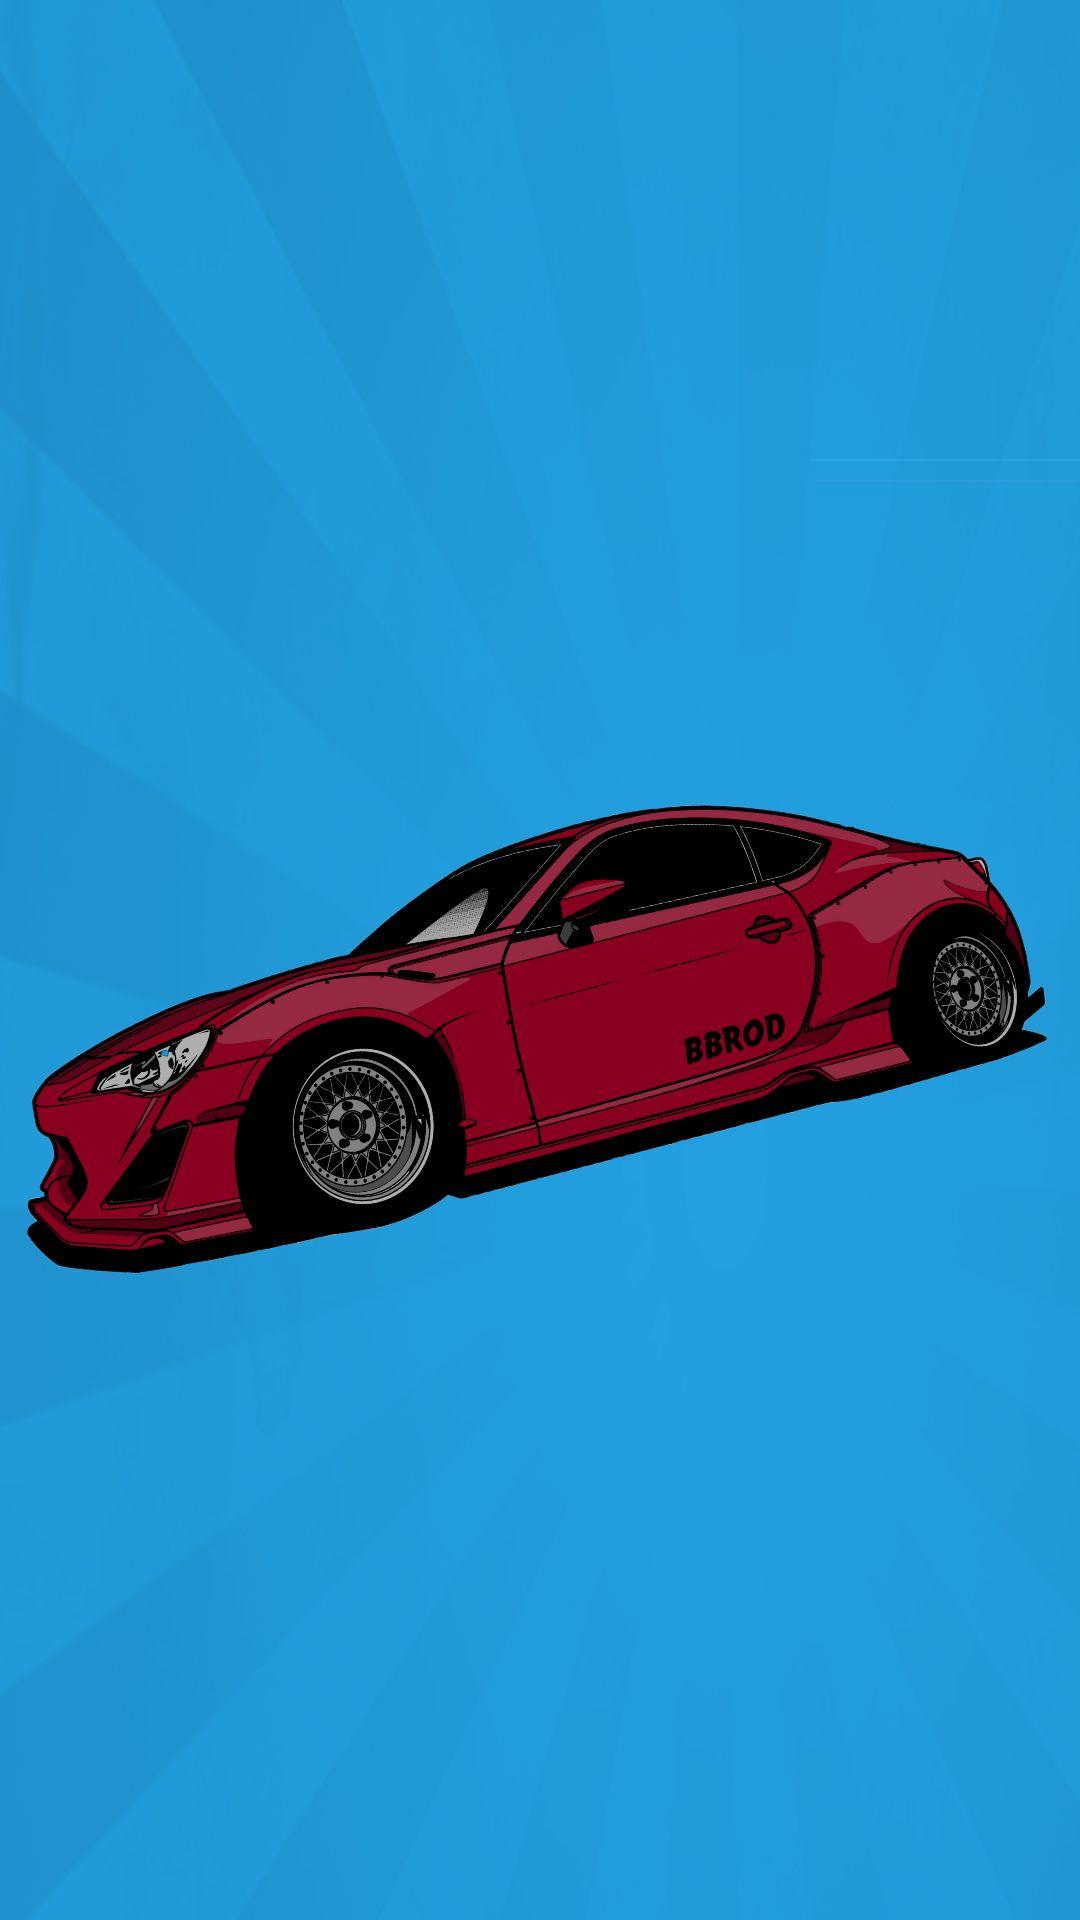 Jdm Nissan Drift Car Auto My Art Hd Pinterest